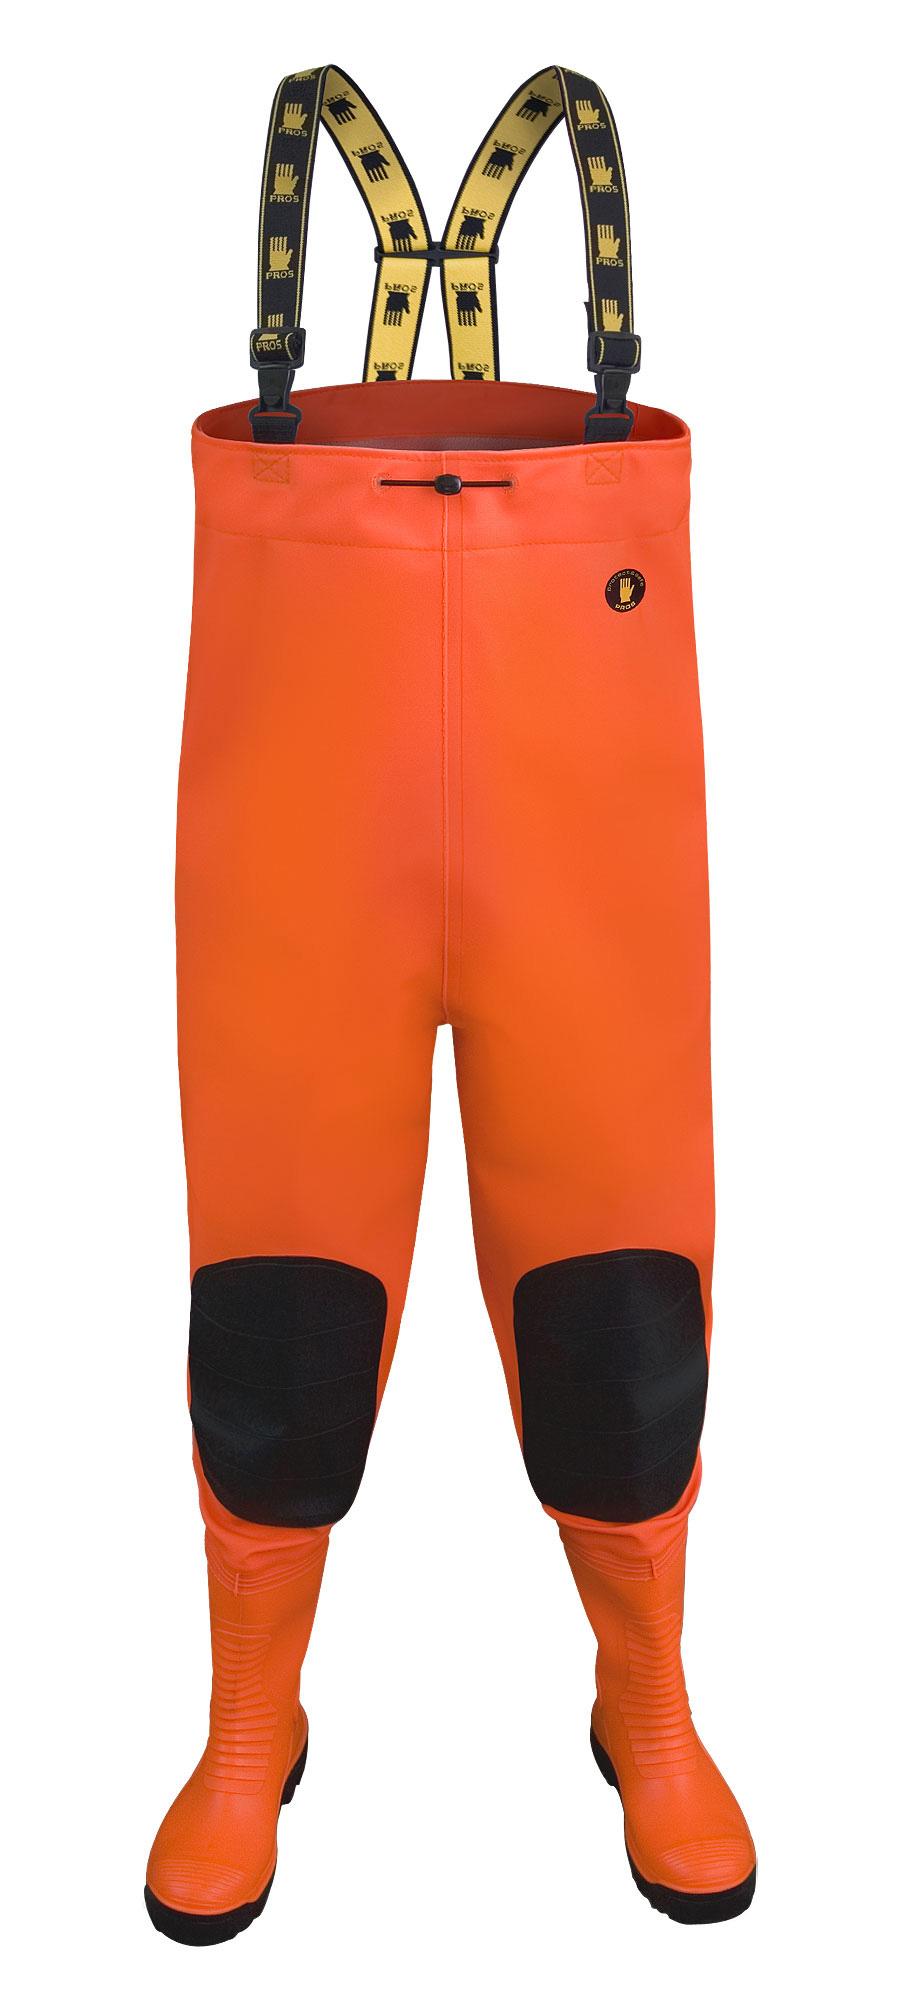 Brodící kalhoty MAX Fluo oranž vel.41    SBM01 Fluo or.  PROS